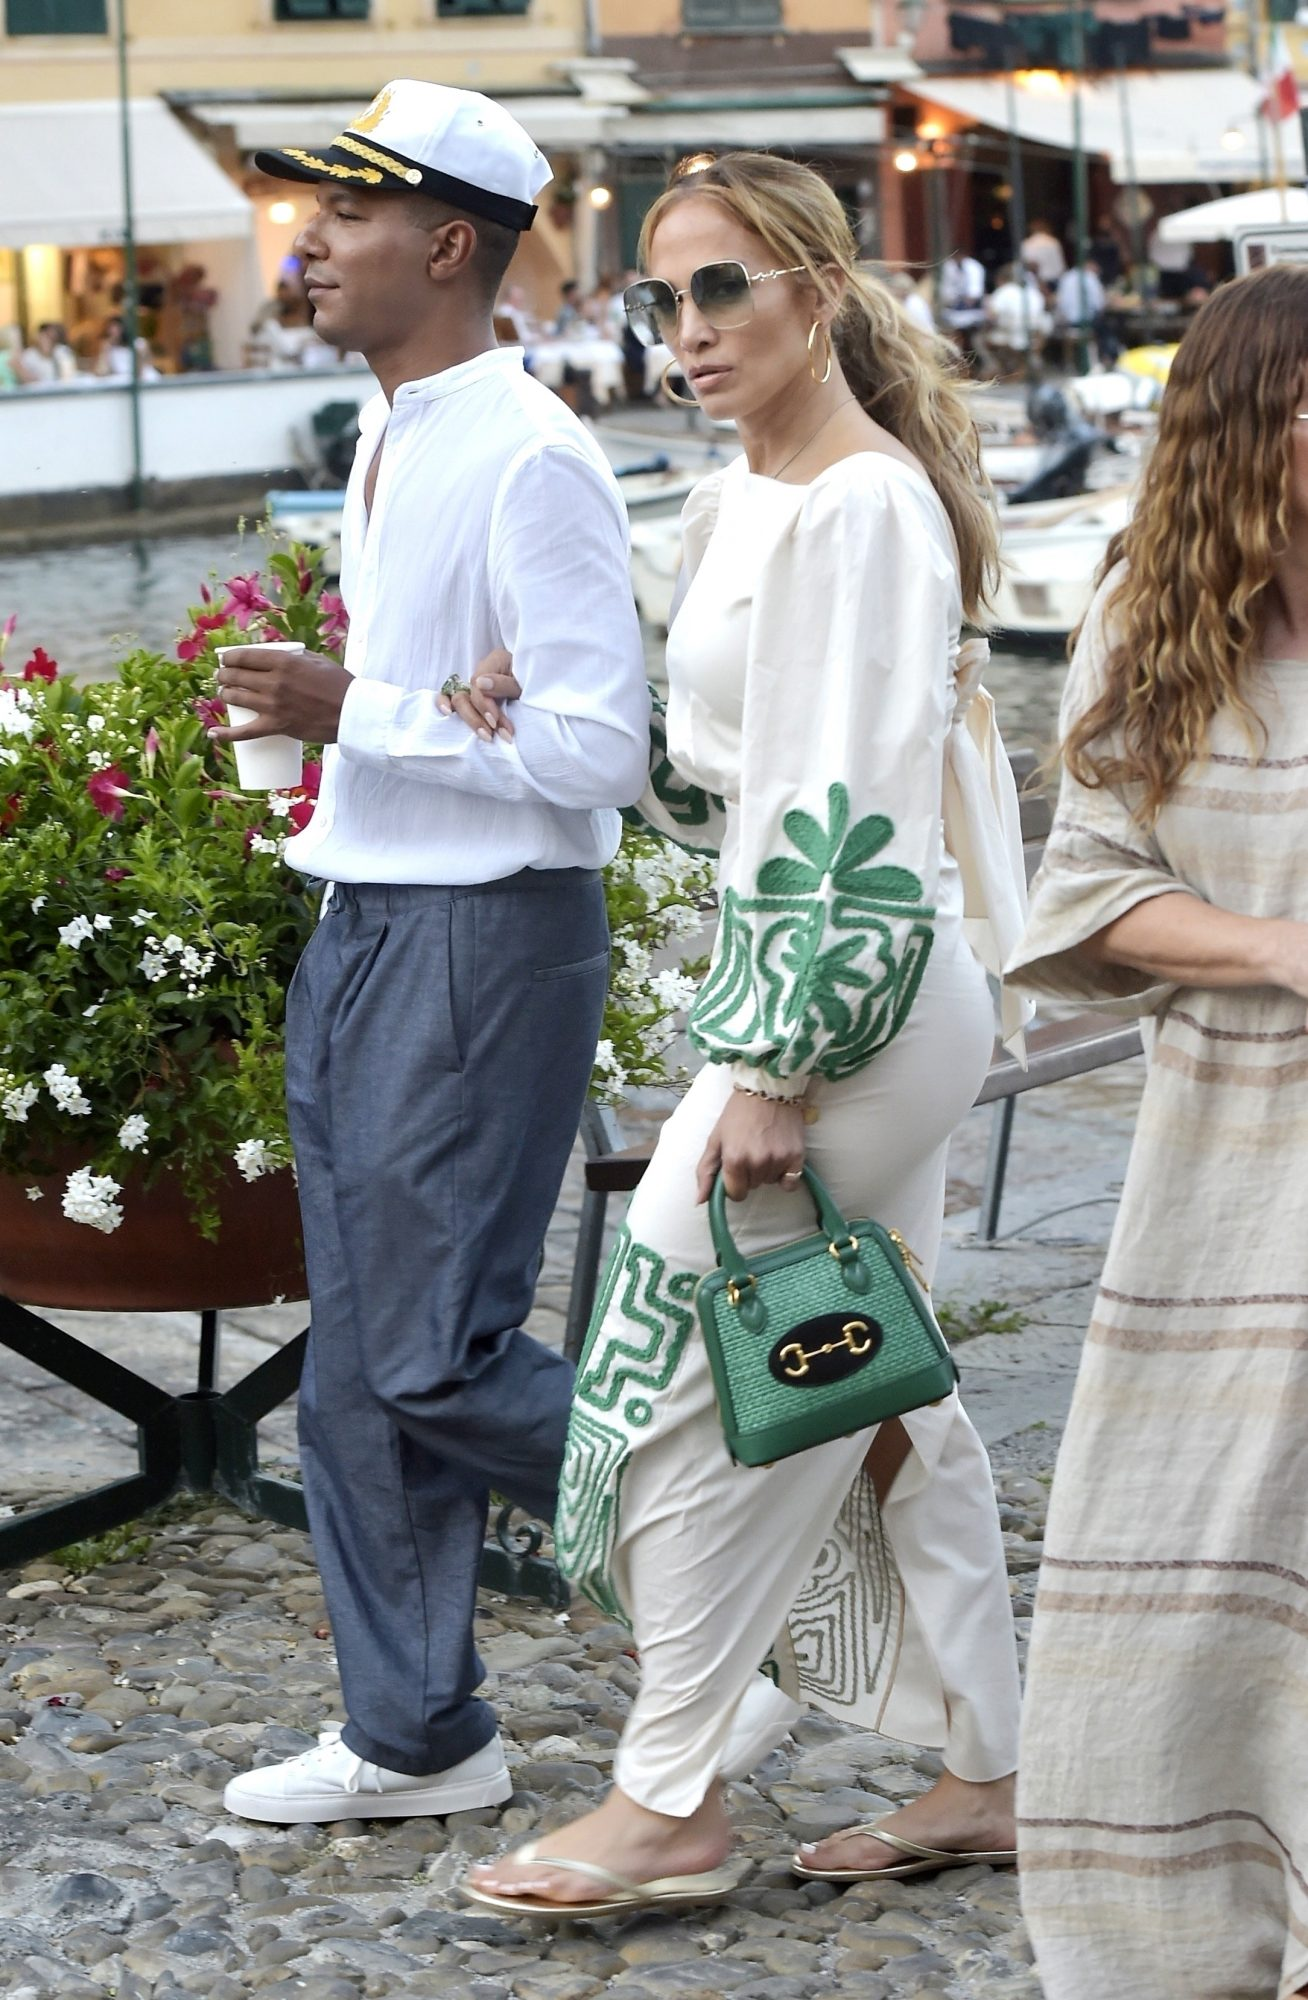 Jennifer Lopez Enjoys Dinner with Wine in Portofino Wearing a Starbucks Inspired Dress